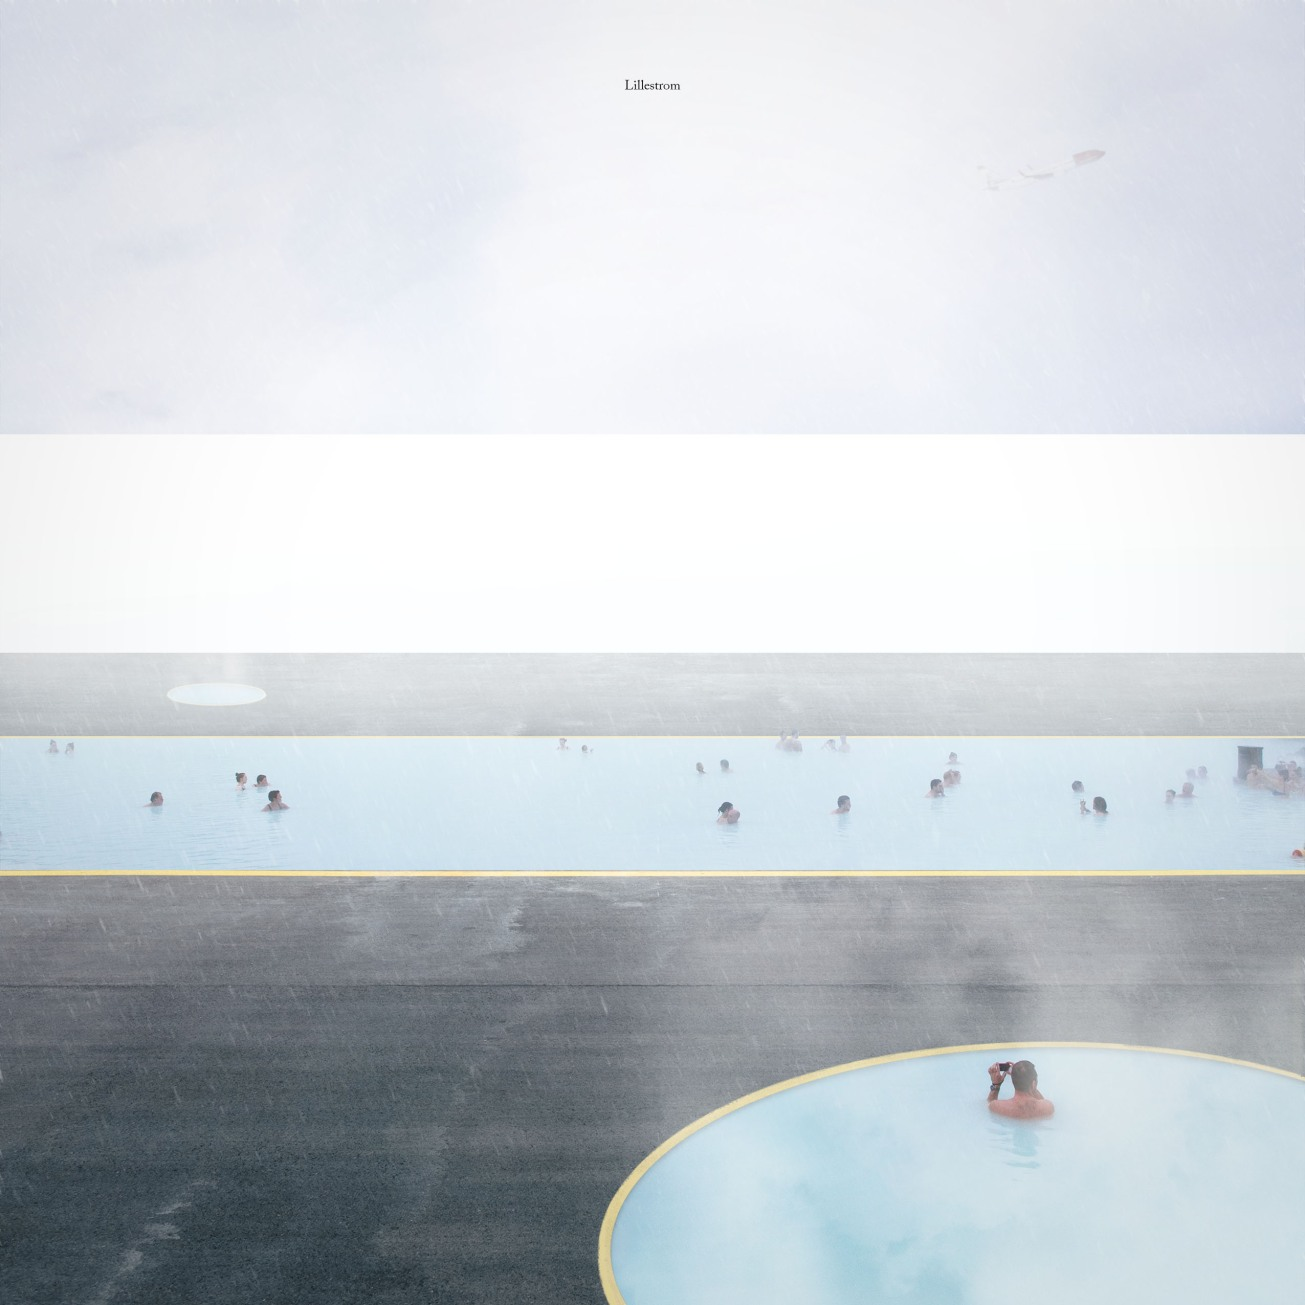 KooZArch_© Tommaso Maserati_Collage Lillestrom-Public Pool